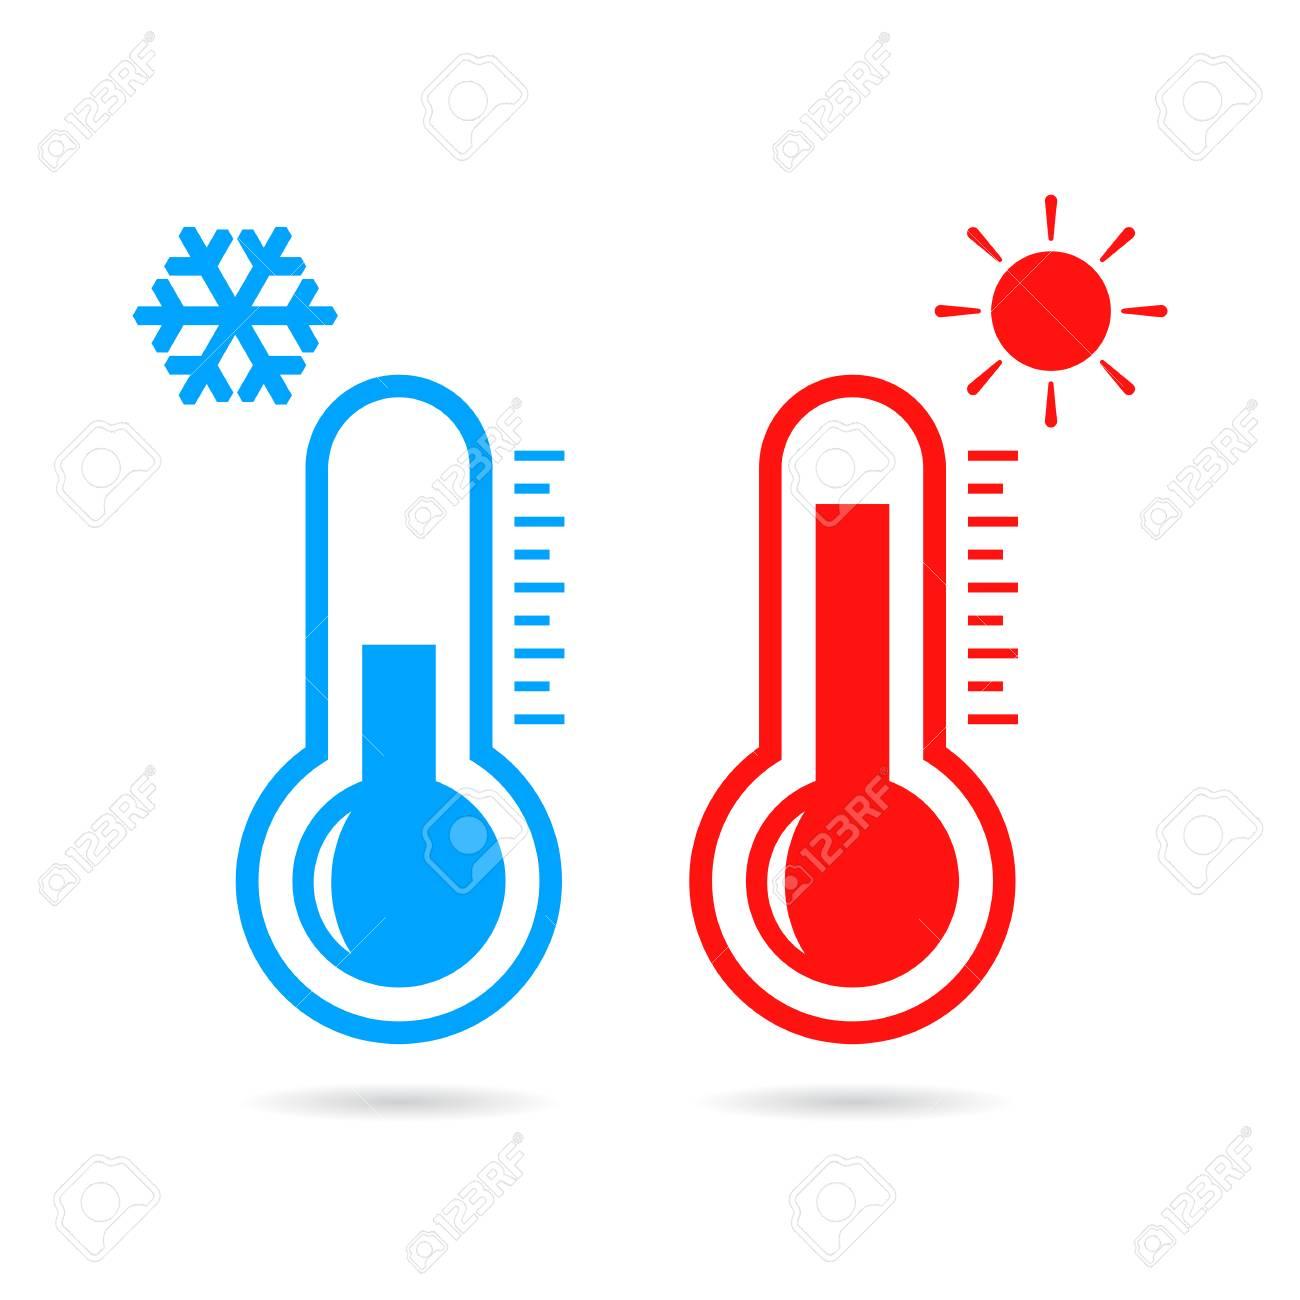 Hot and cold temperature vector icon - 106319224